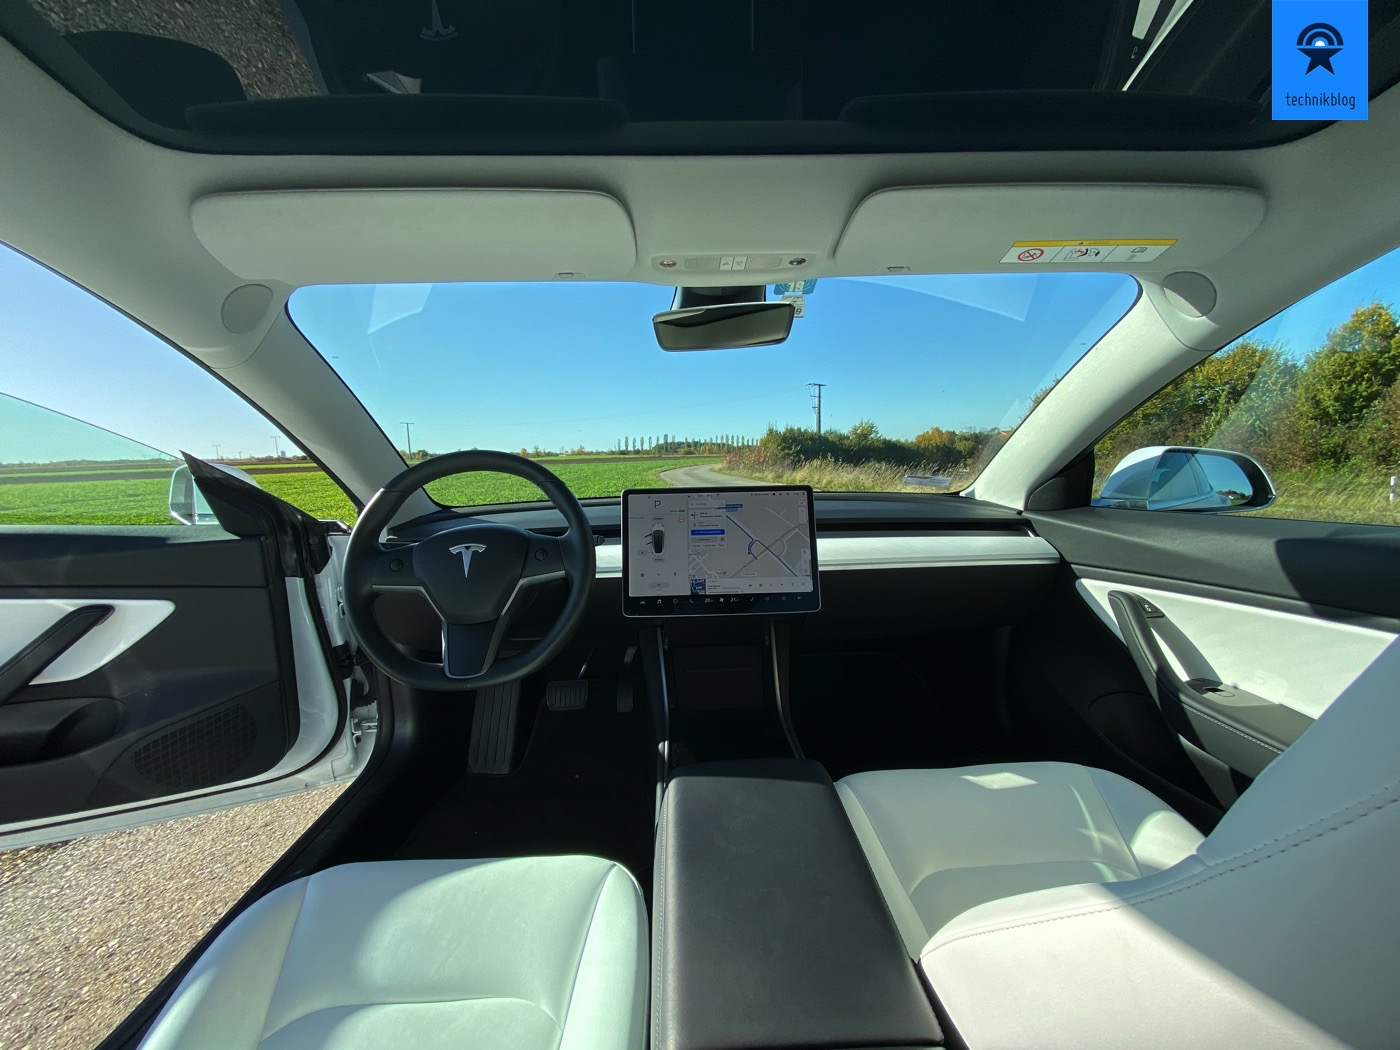 Tesla Model 3 Innenraum mit iPhone 11 Pro Ultraweitwinkel